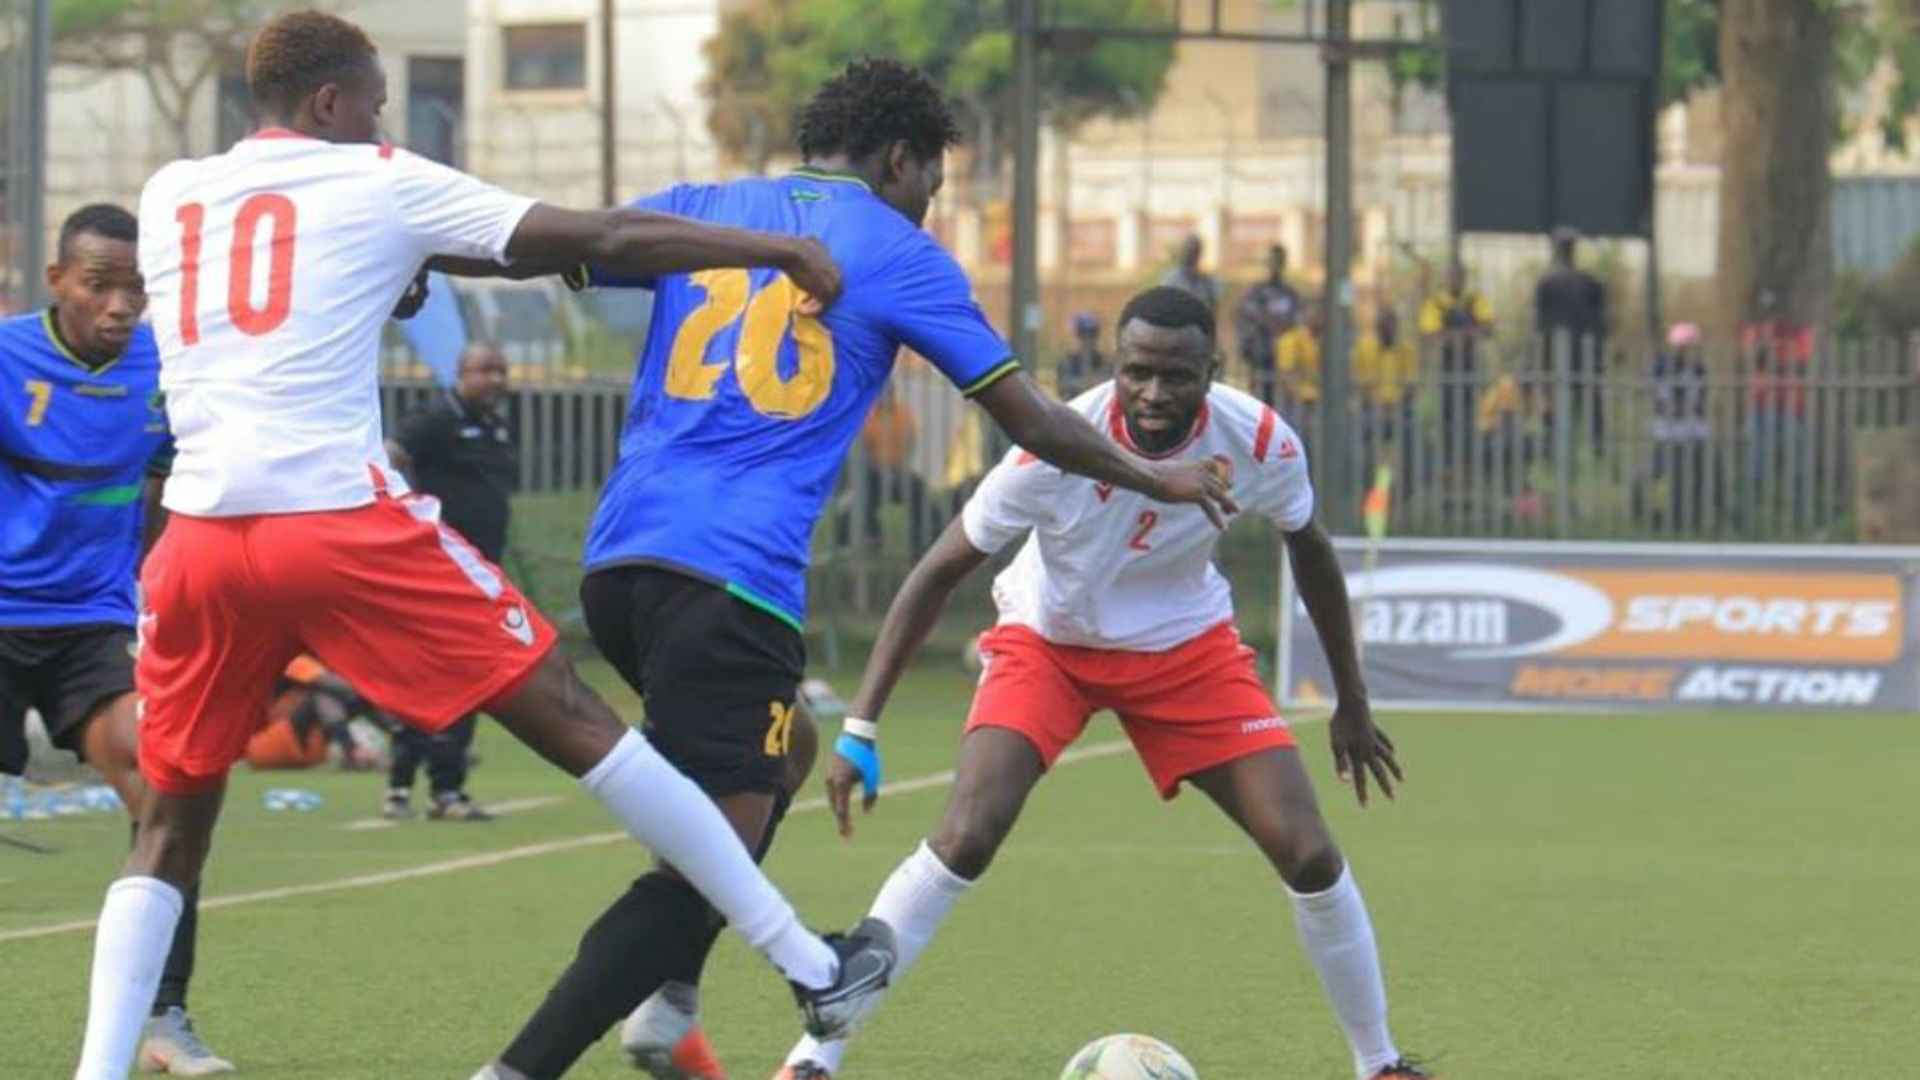 KPL challenges will have ripple effect on Harambee Stars - Kasaya